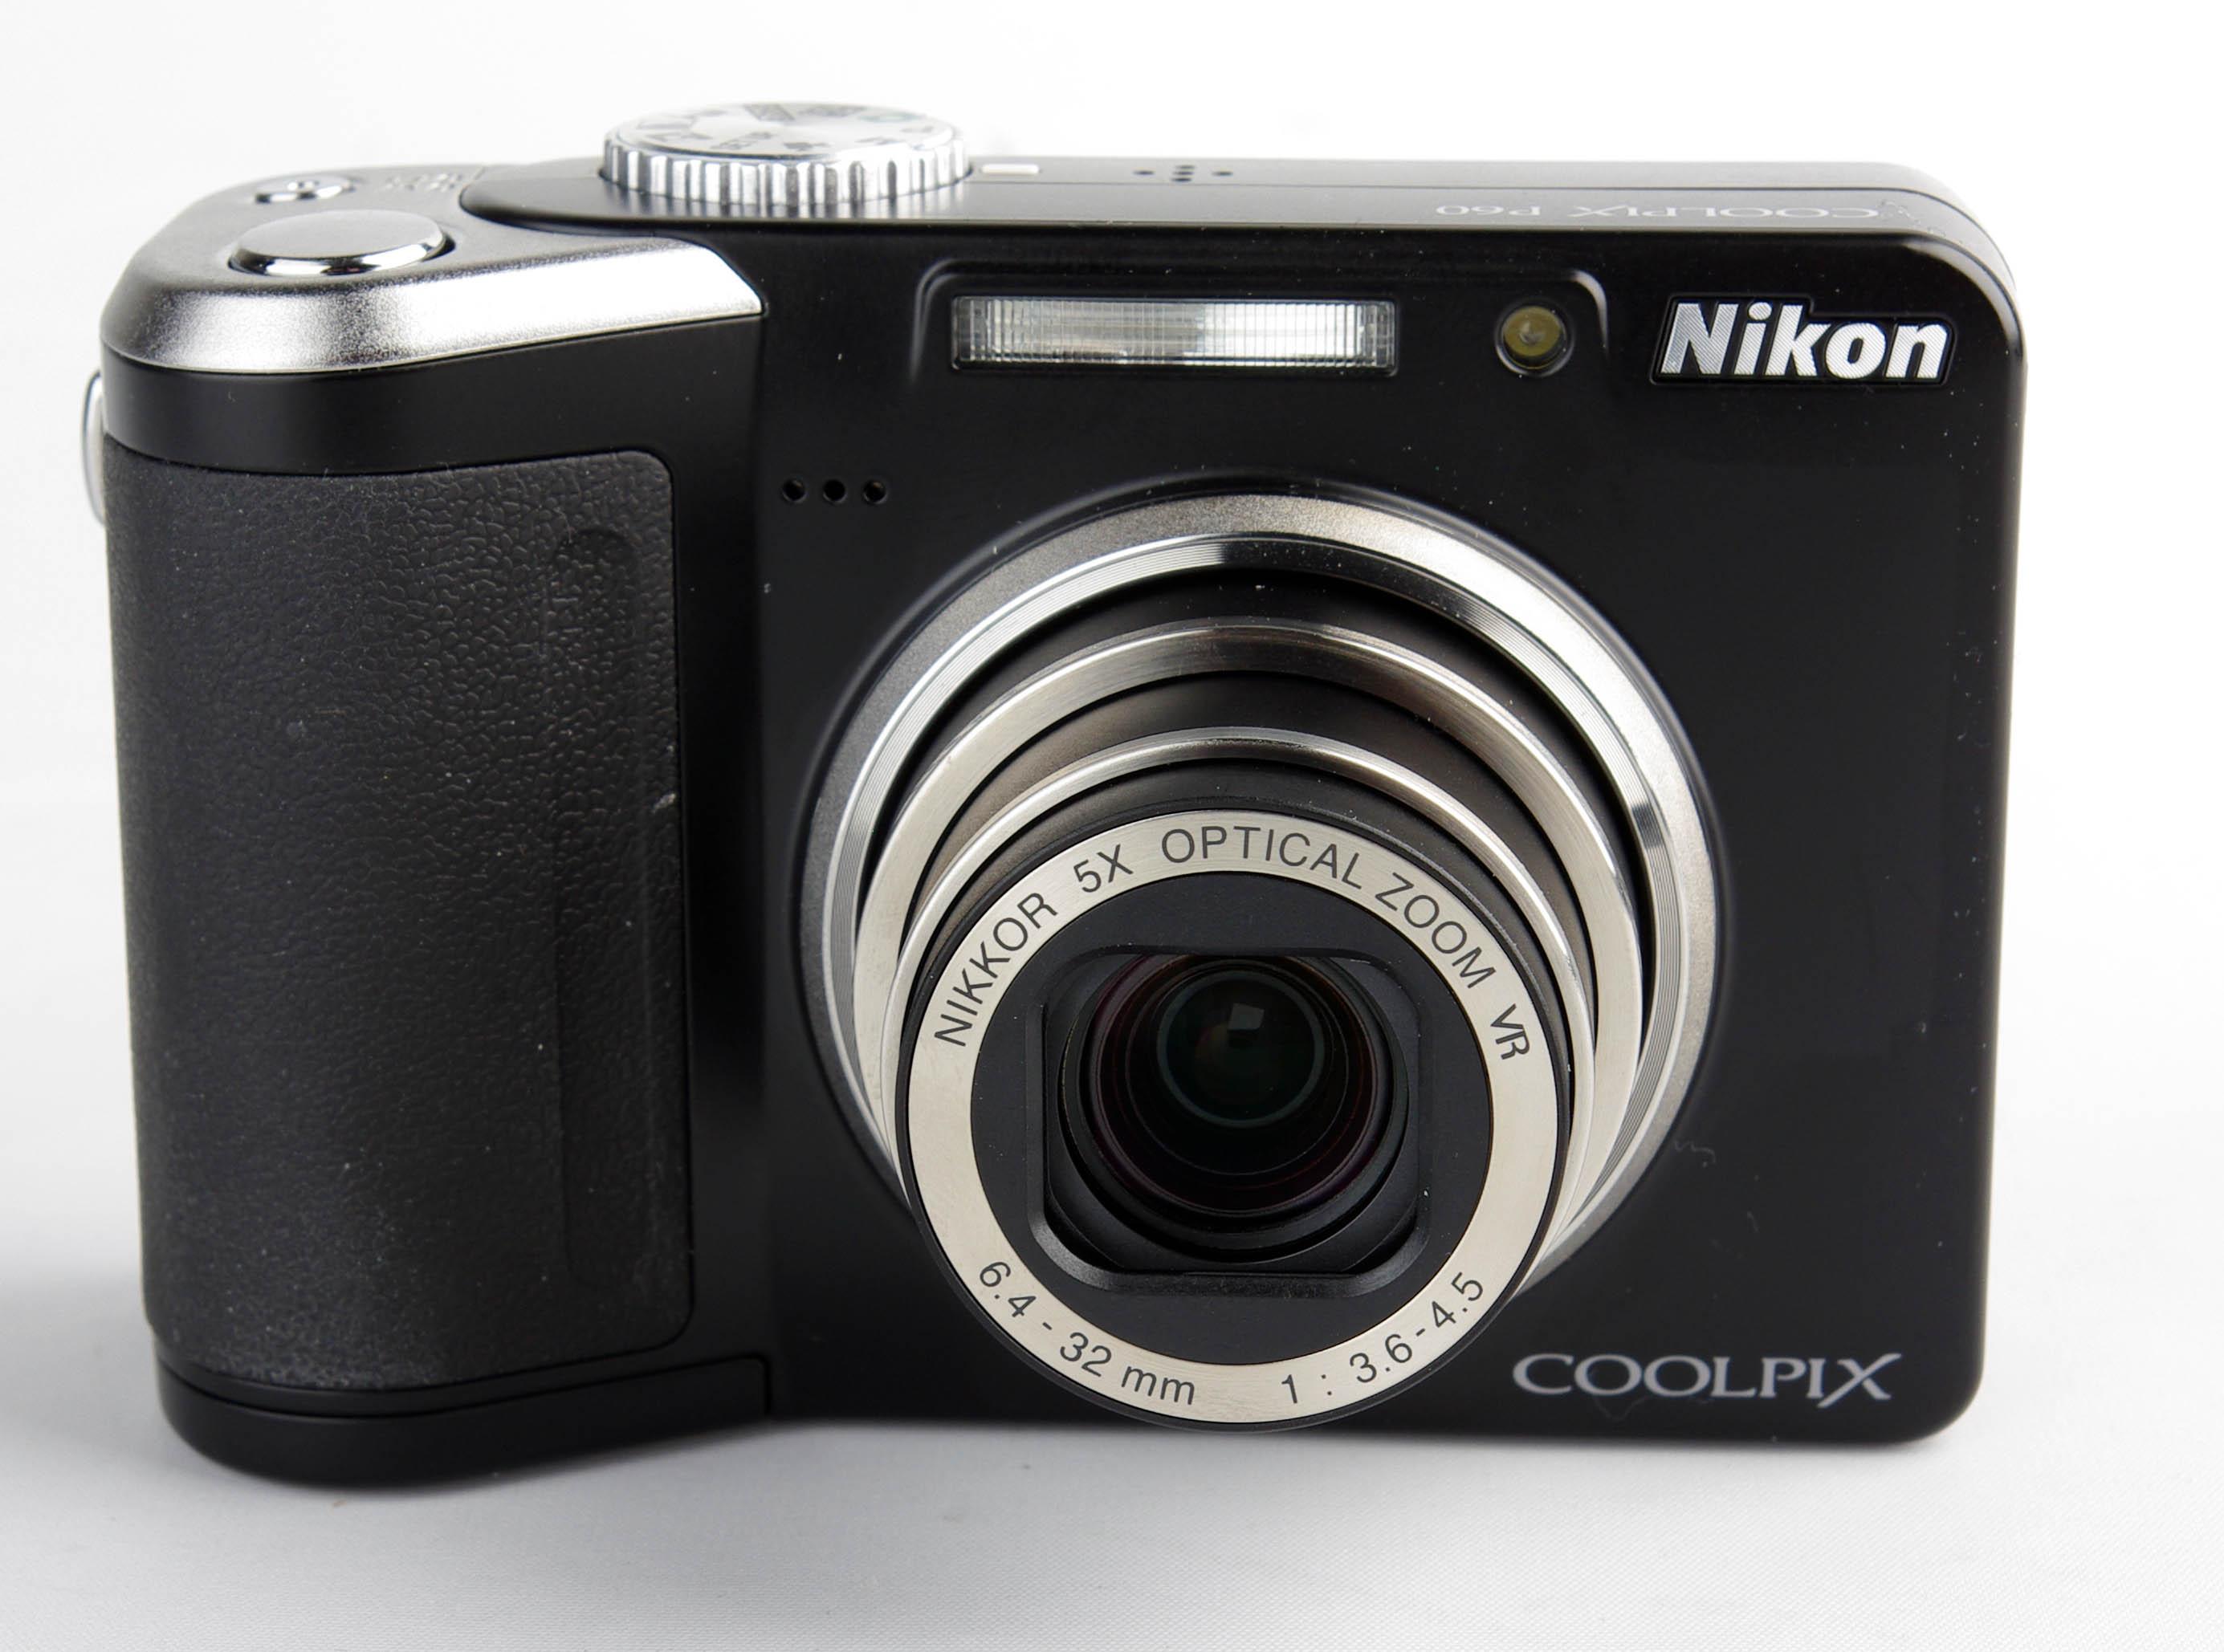 nikon coolpix p60 digital camera review rh ephotozine com Nikon D3000 Manual nikon coolpix p60 manual